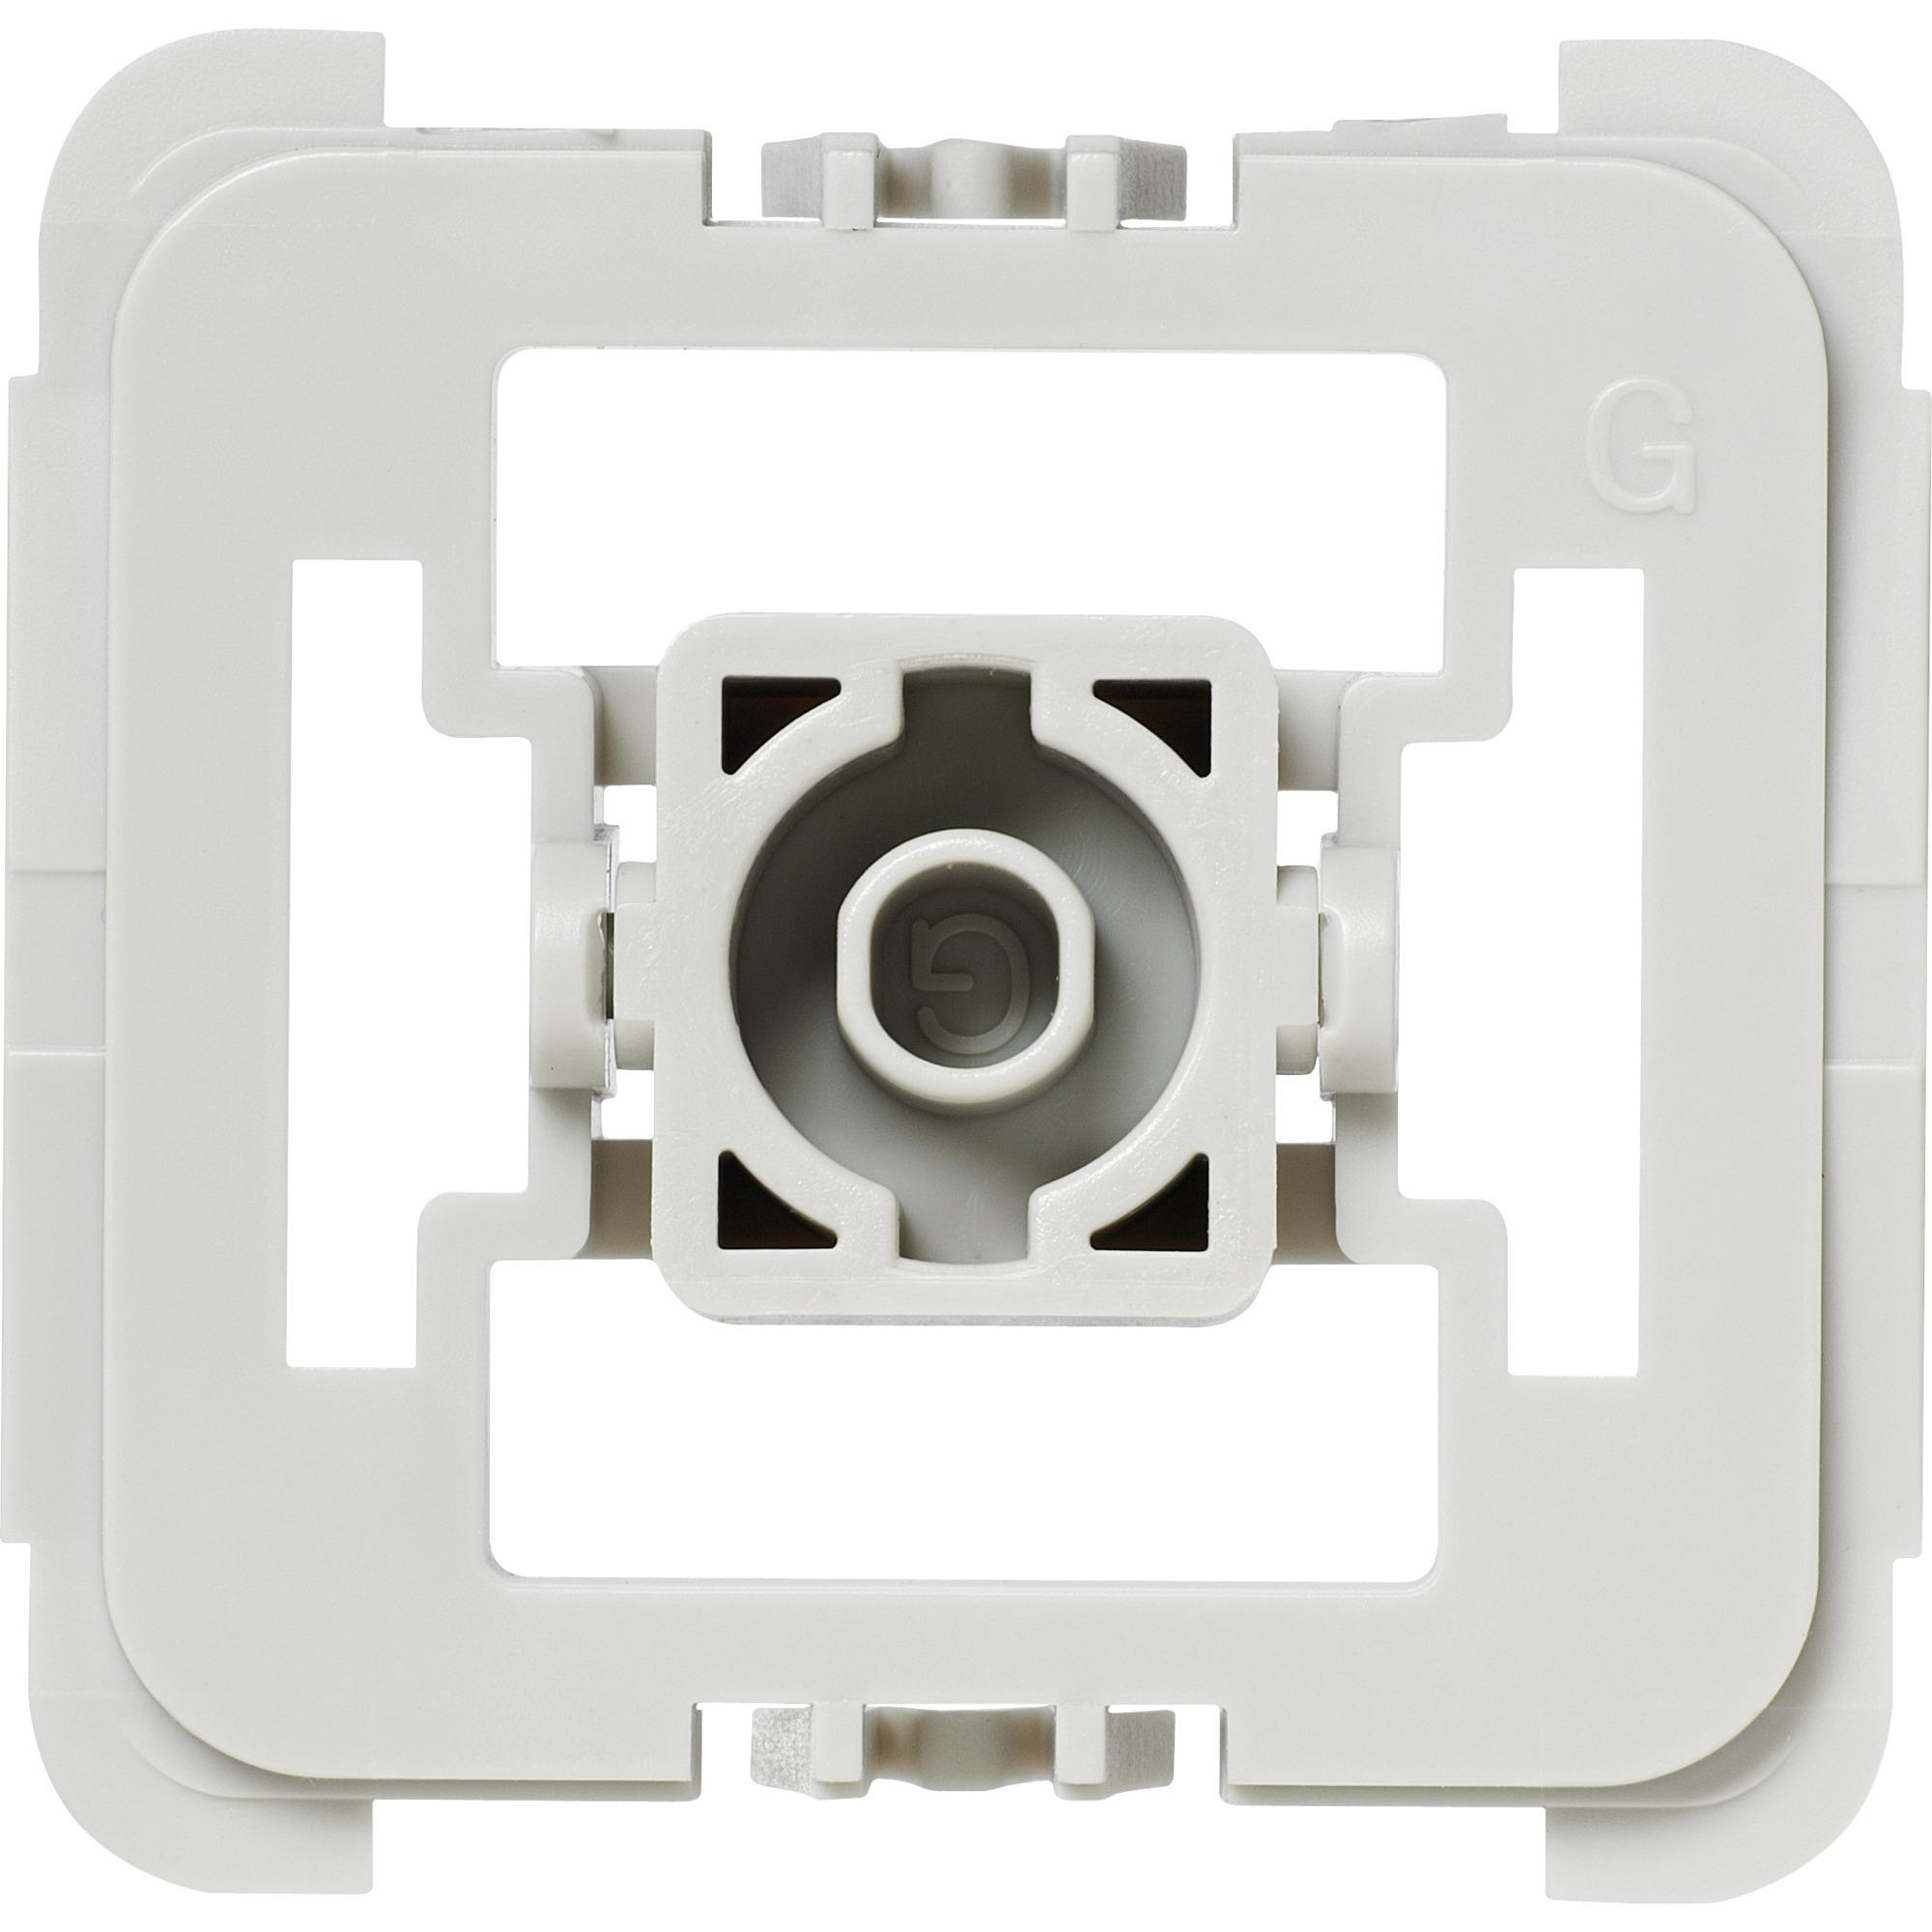 EQ3-ADA-G55 Integrado Atenuador e interruptor Blanco, Adaptador